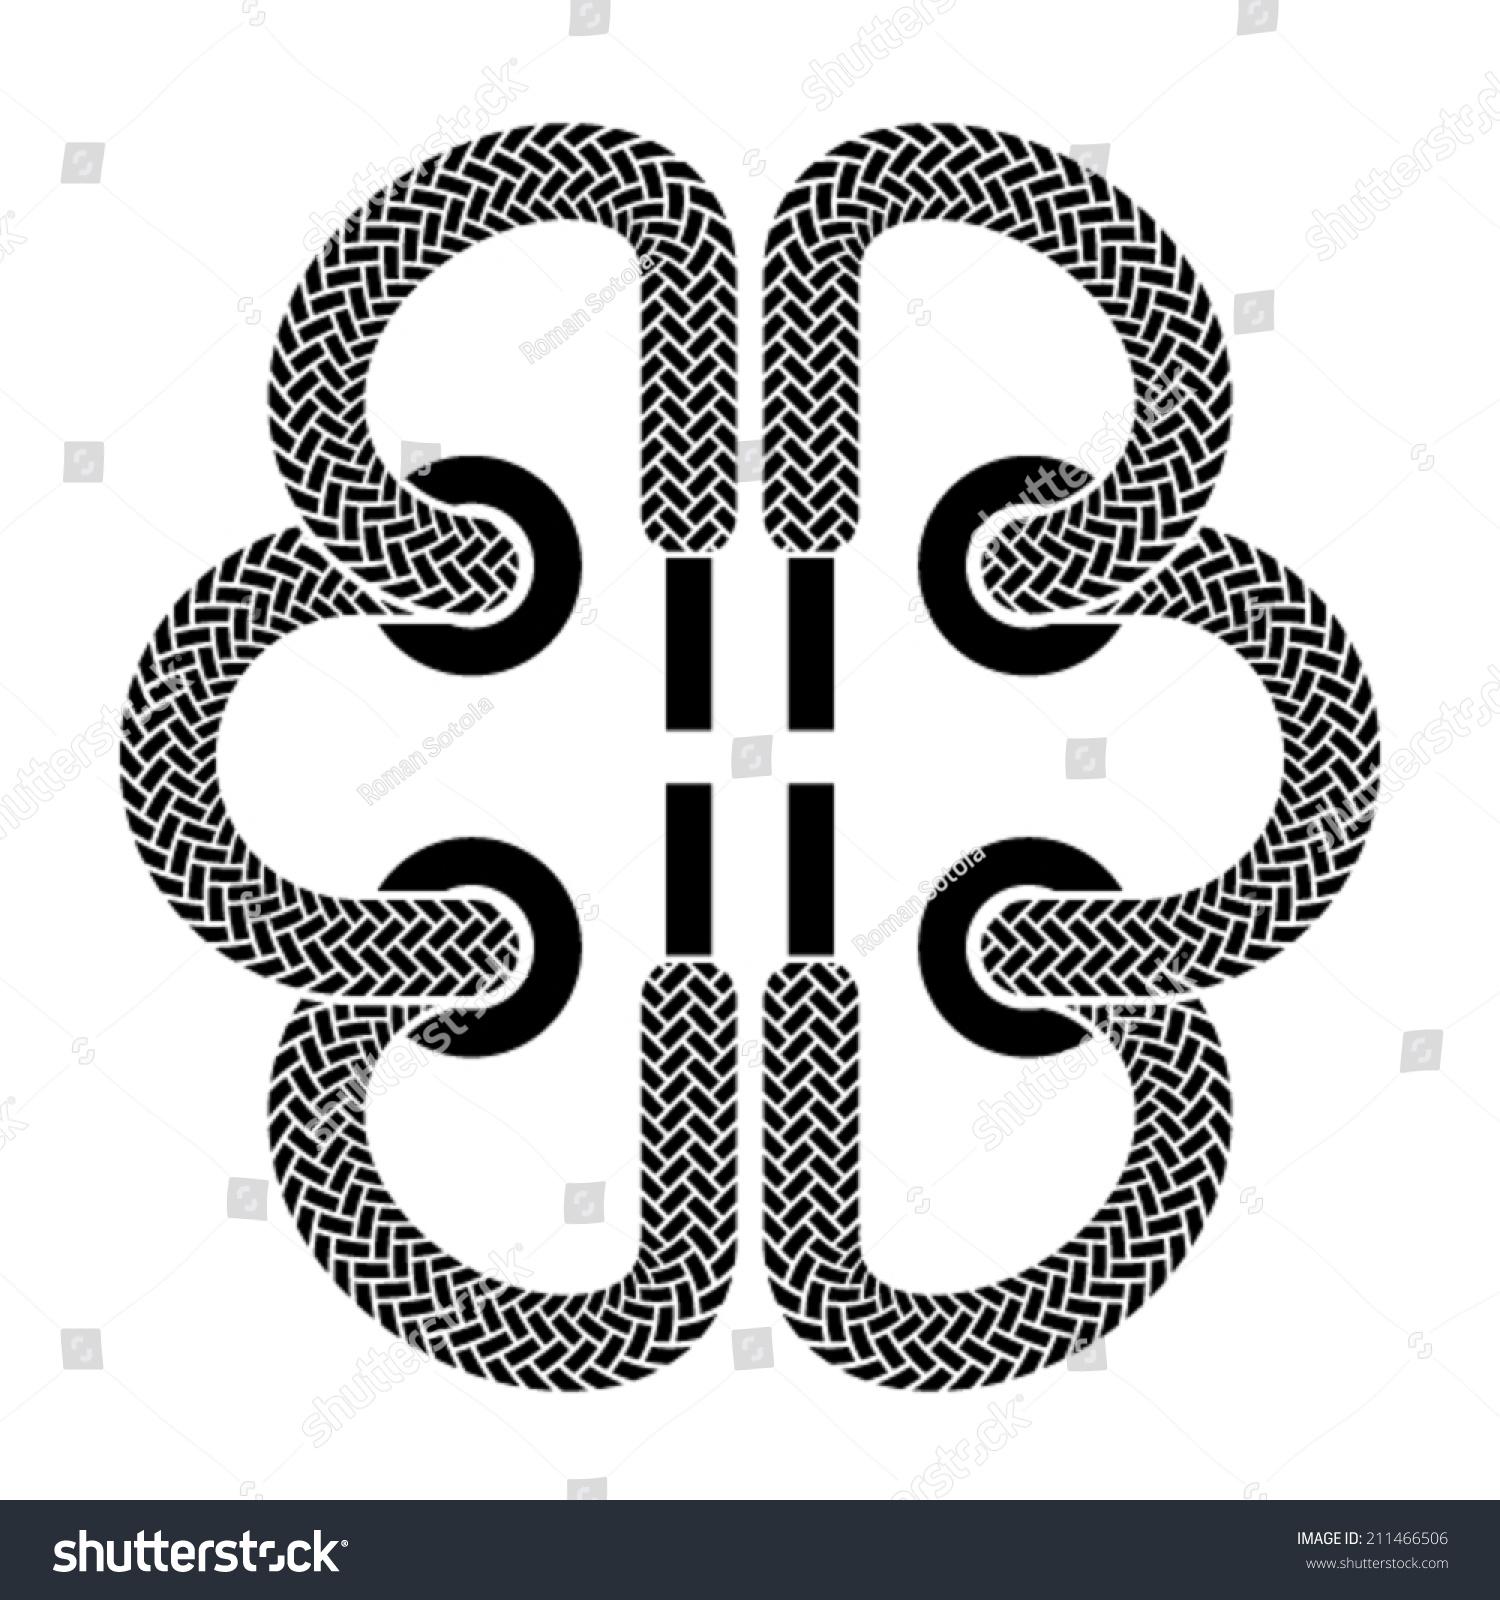 Vector shoe lace brain symbol stock vector 211466506 shutterstock vector shoe lace brain symbol biocorpaavc Images